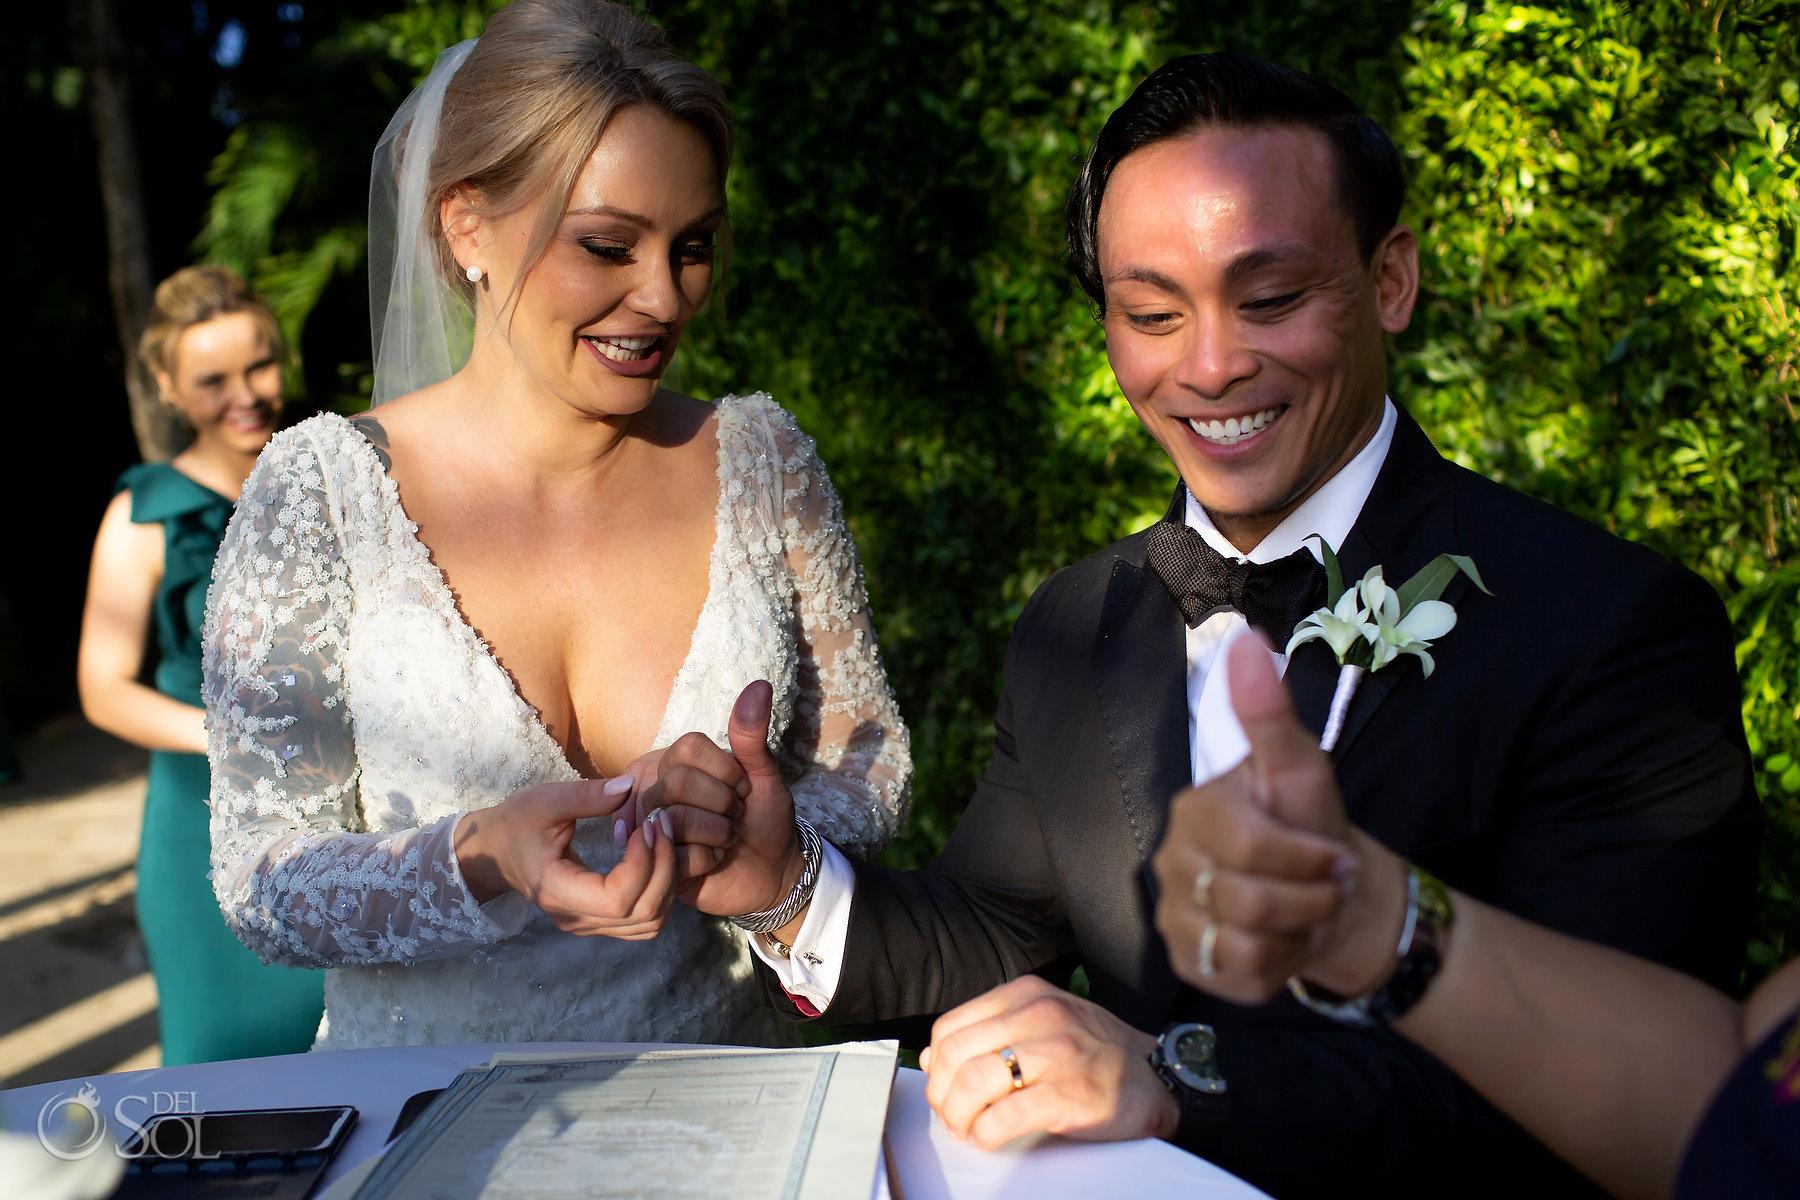 Legal wedding ceremony Playa Del Carmen Mexico finger prints